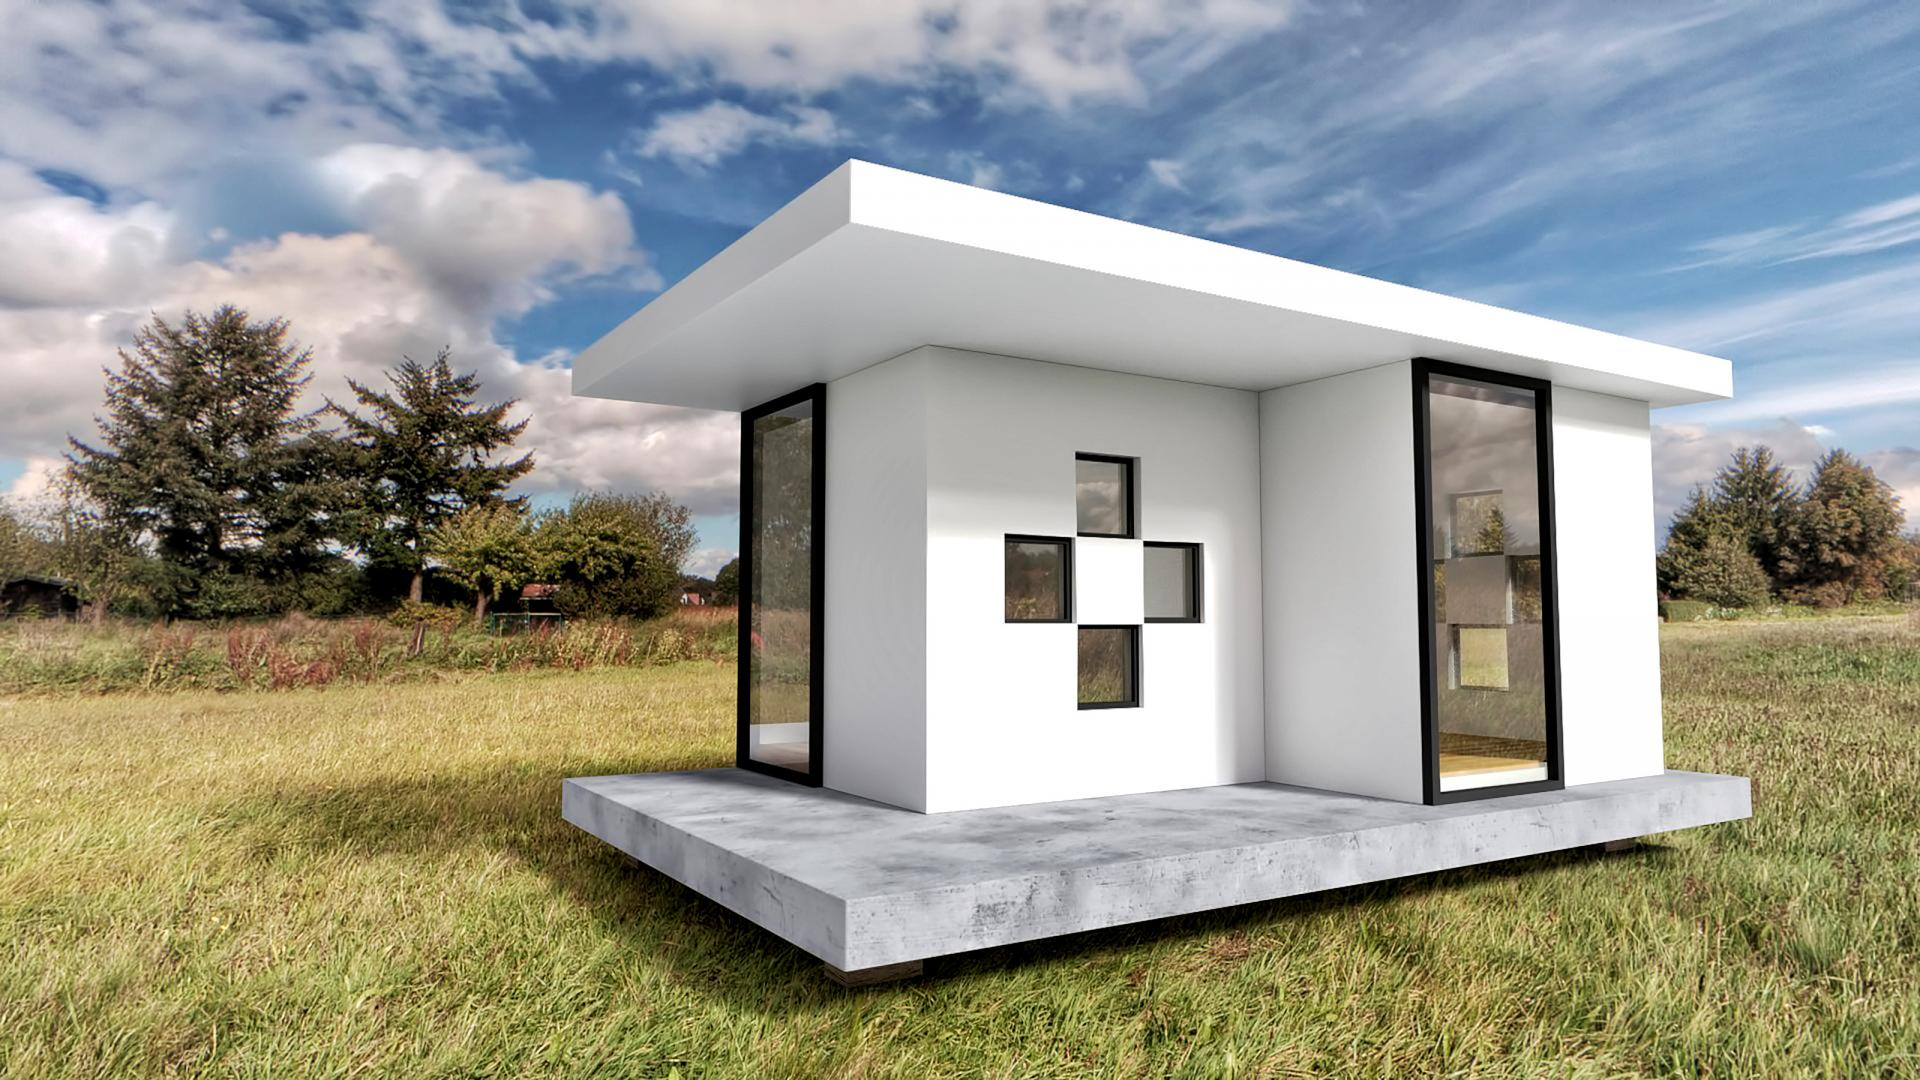 Arhitekturni minimalizem – stanovanje na dobrih sedmih ali hiša na 30 kvadratih